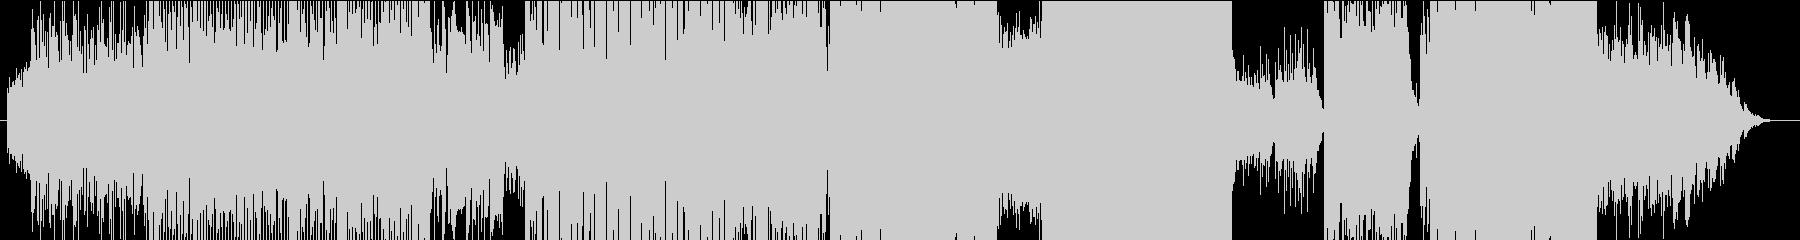 LASTの未再生の波形